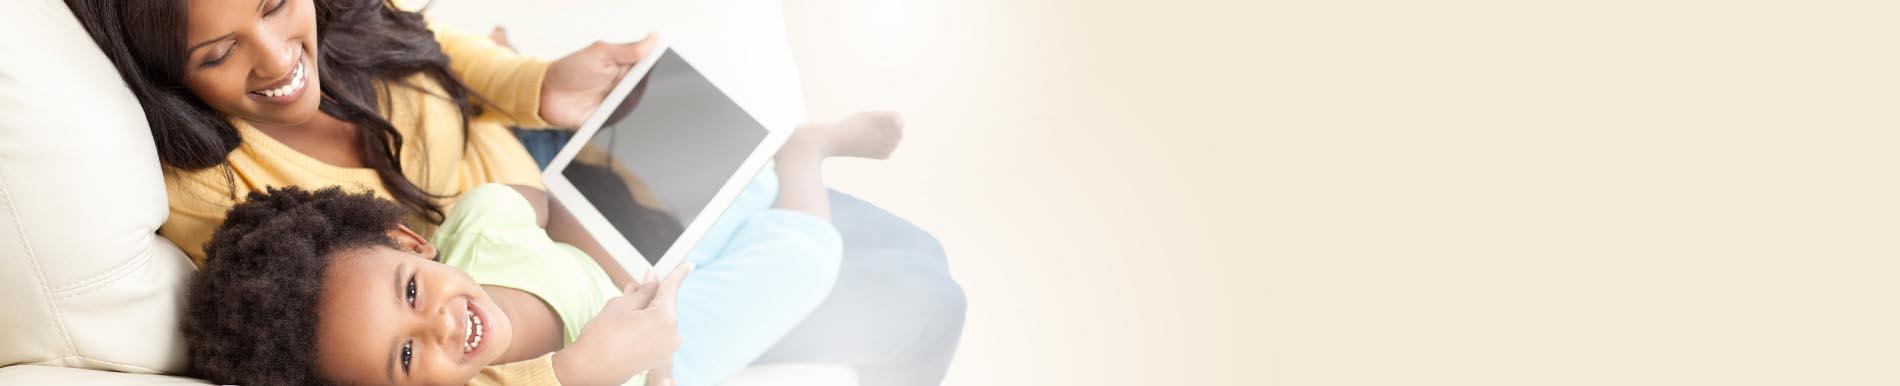 https://www.healthychildren.org/SiteCollectionImage-Homepage-Banners/header_media_plan.jpg